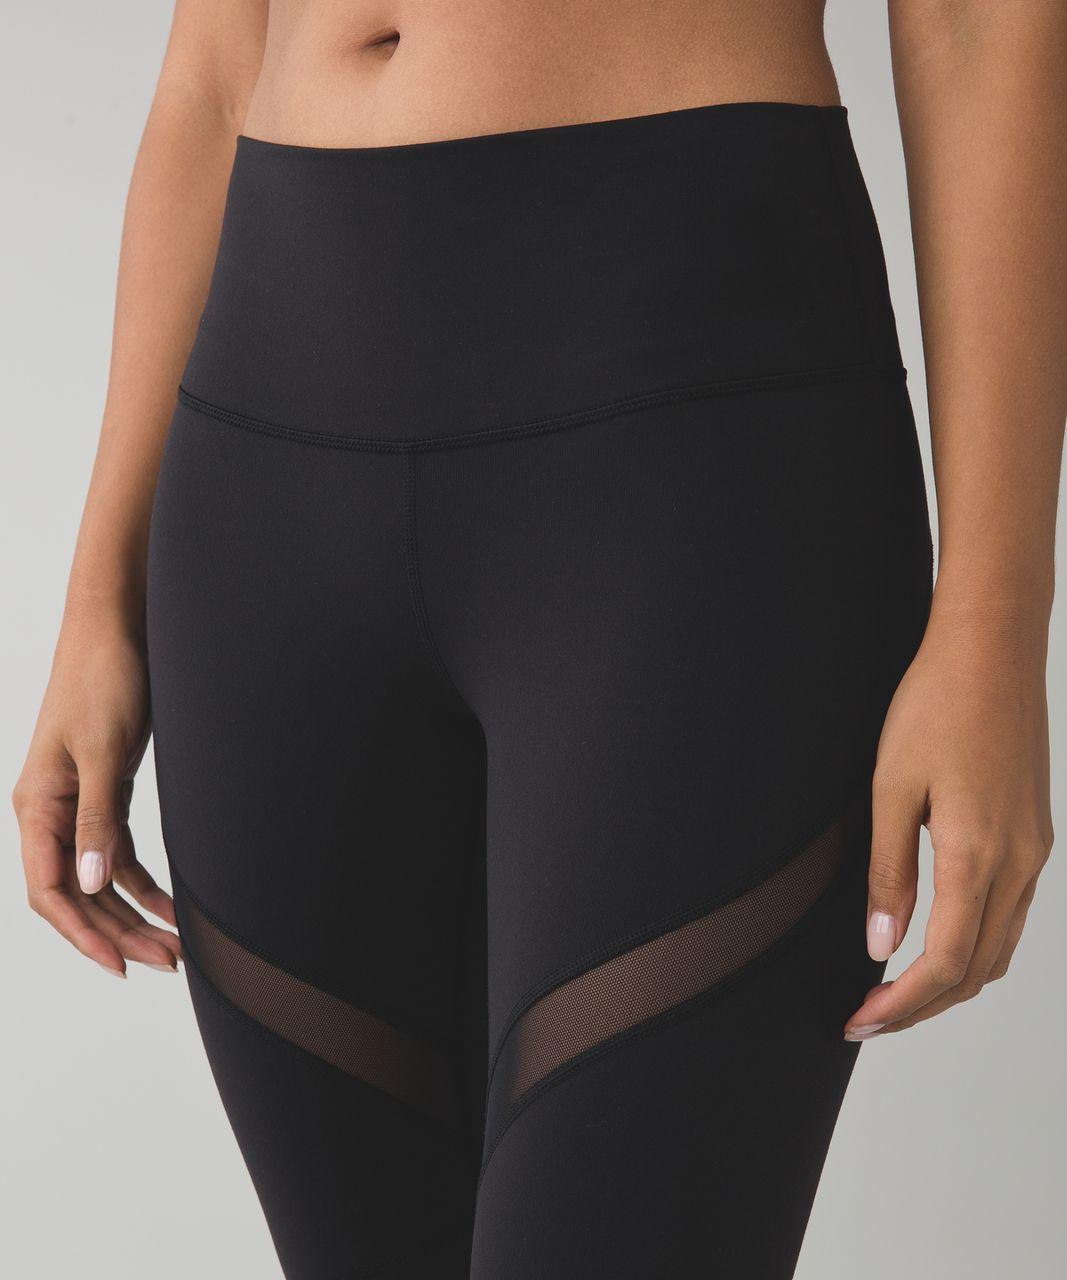 Lululemon High Times Pant (Wrap Mesh) - Black